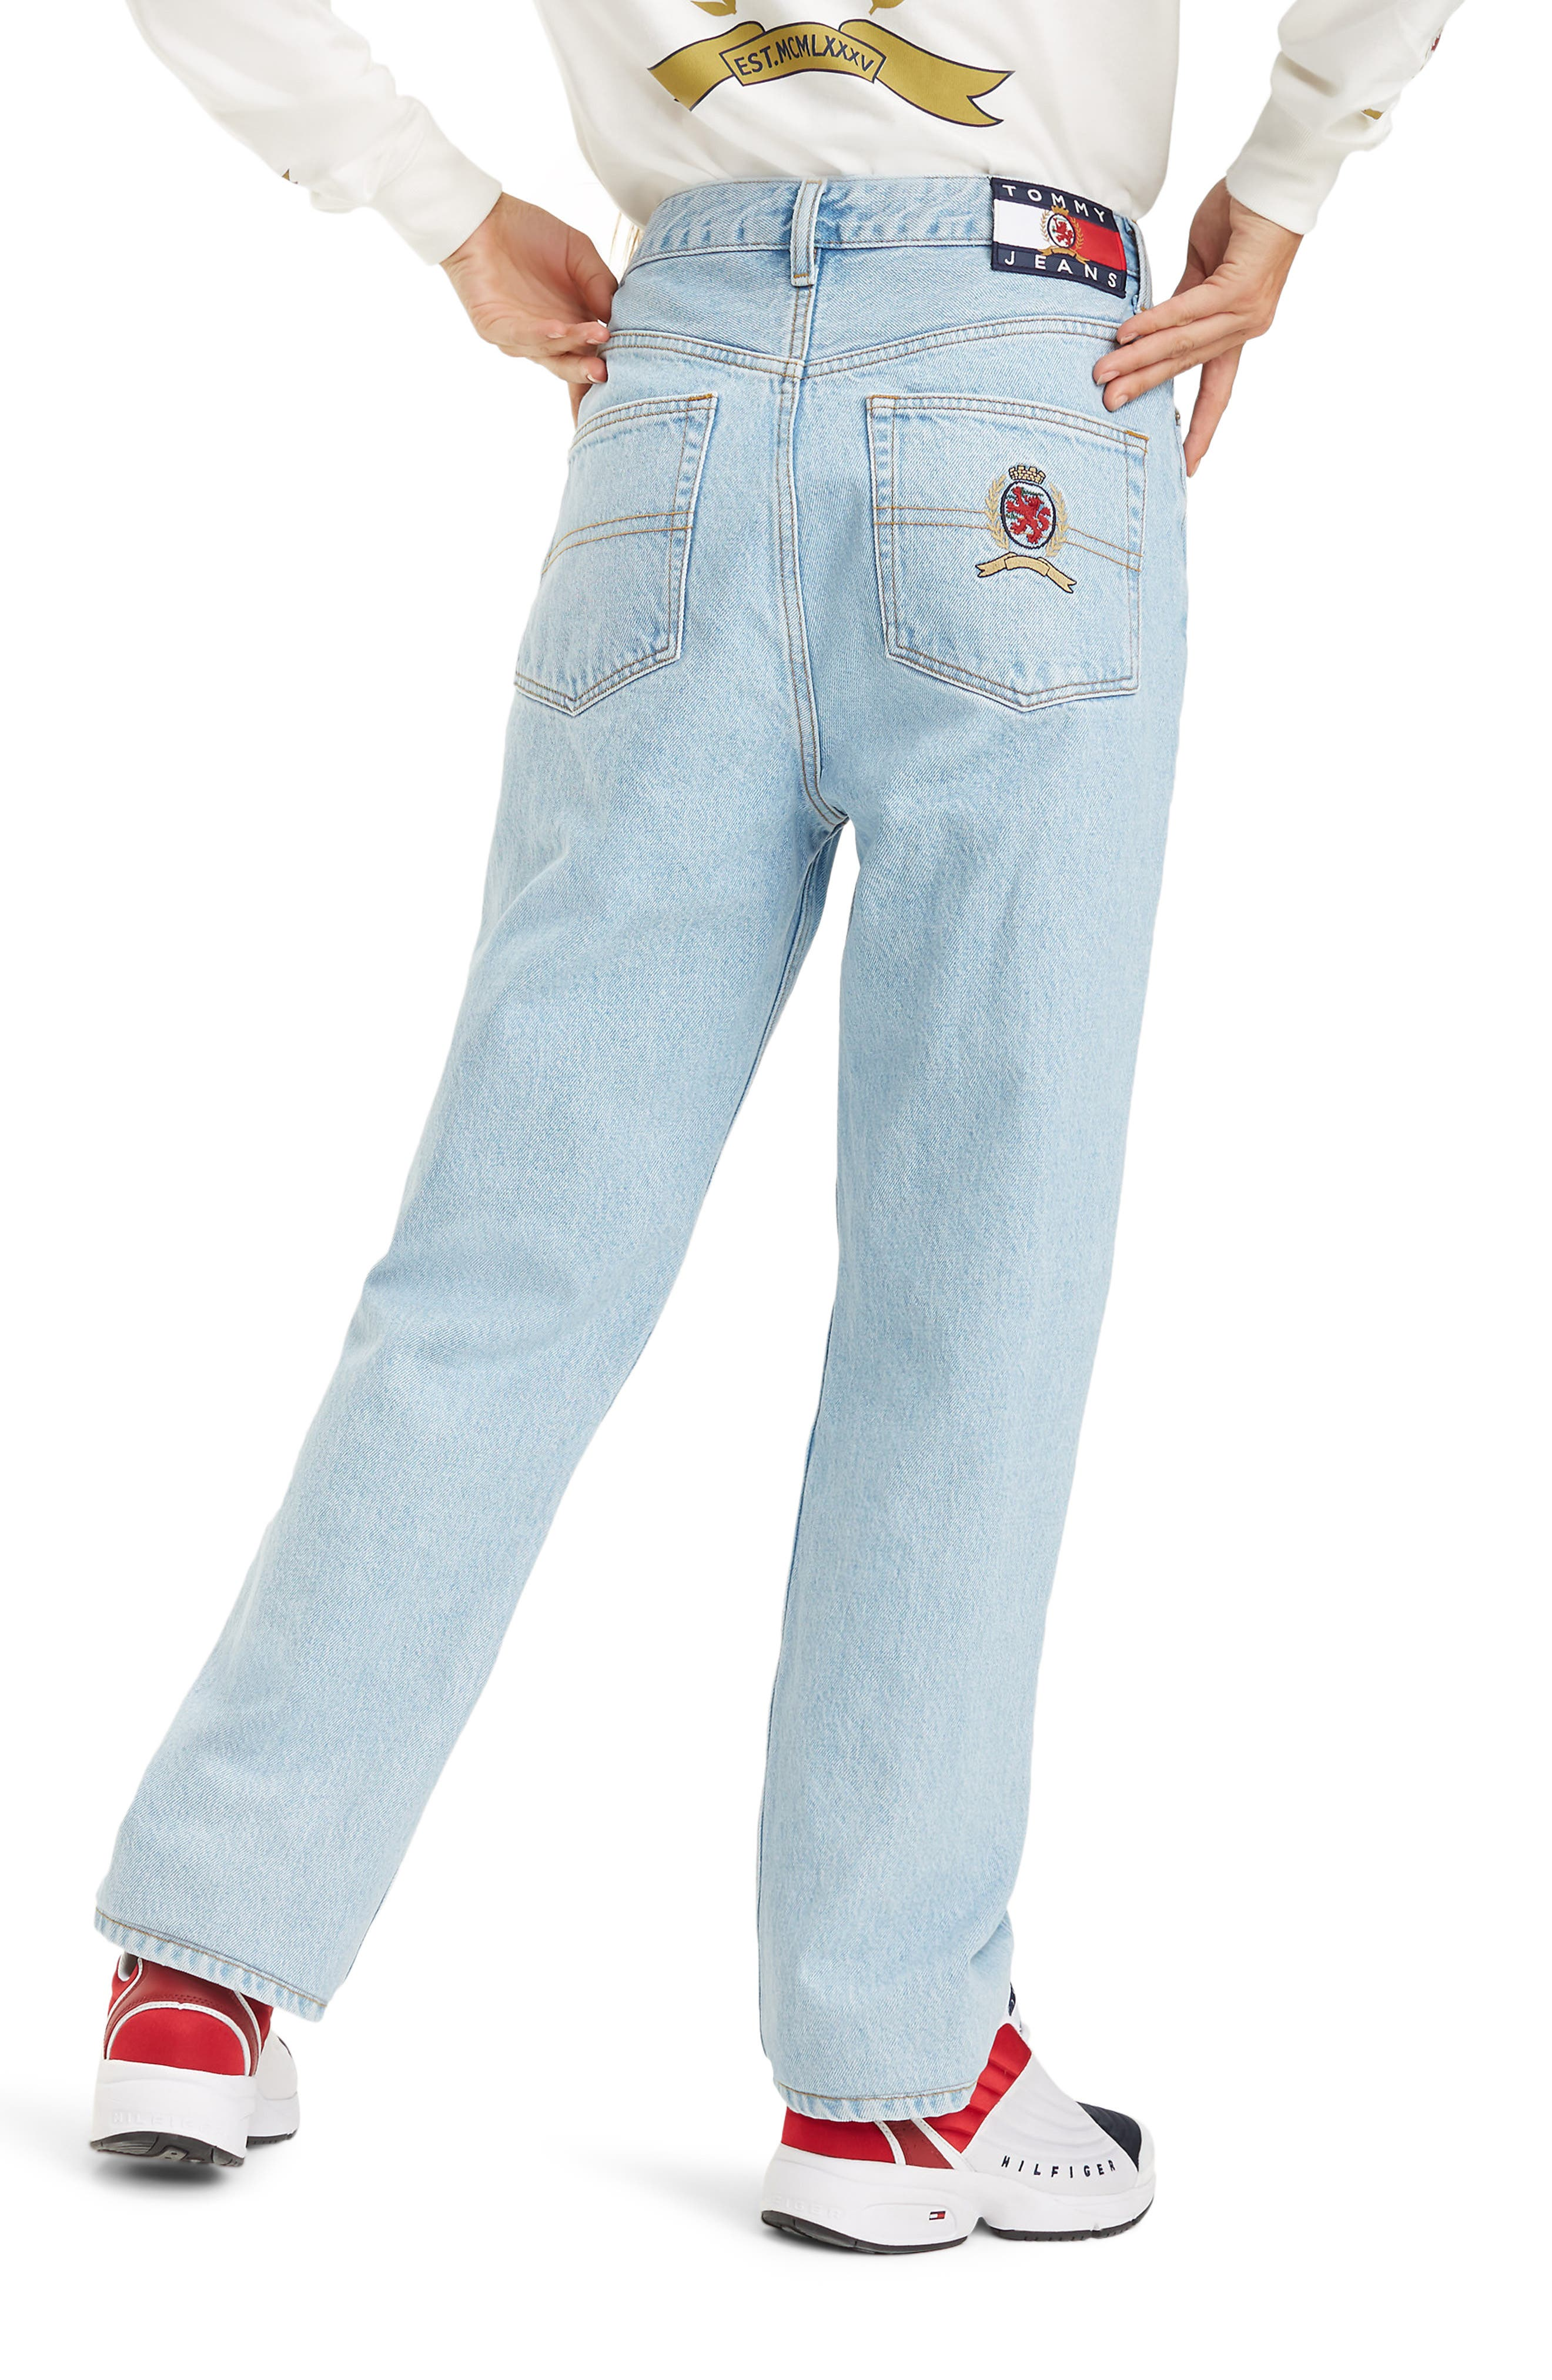 Crest Capsule Mom Jeans,                             Alternate thumbnail 2, color,                             LIGHT BLUE DENIM